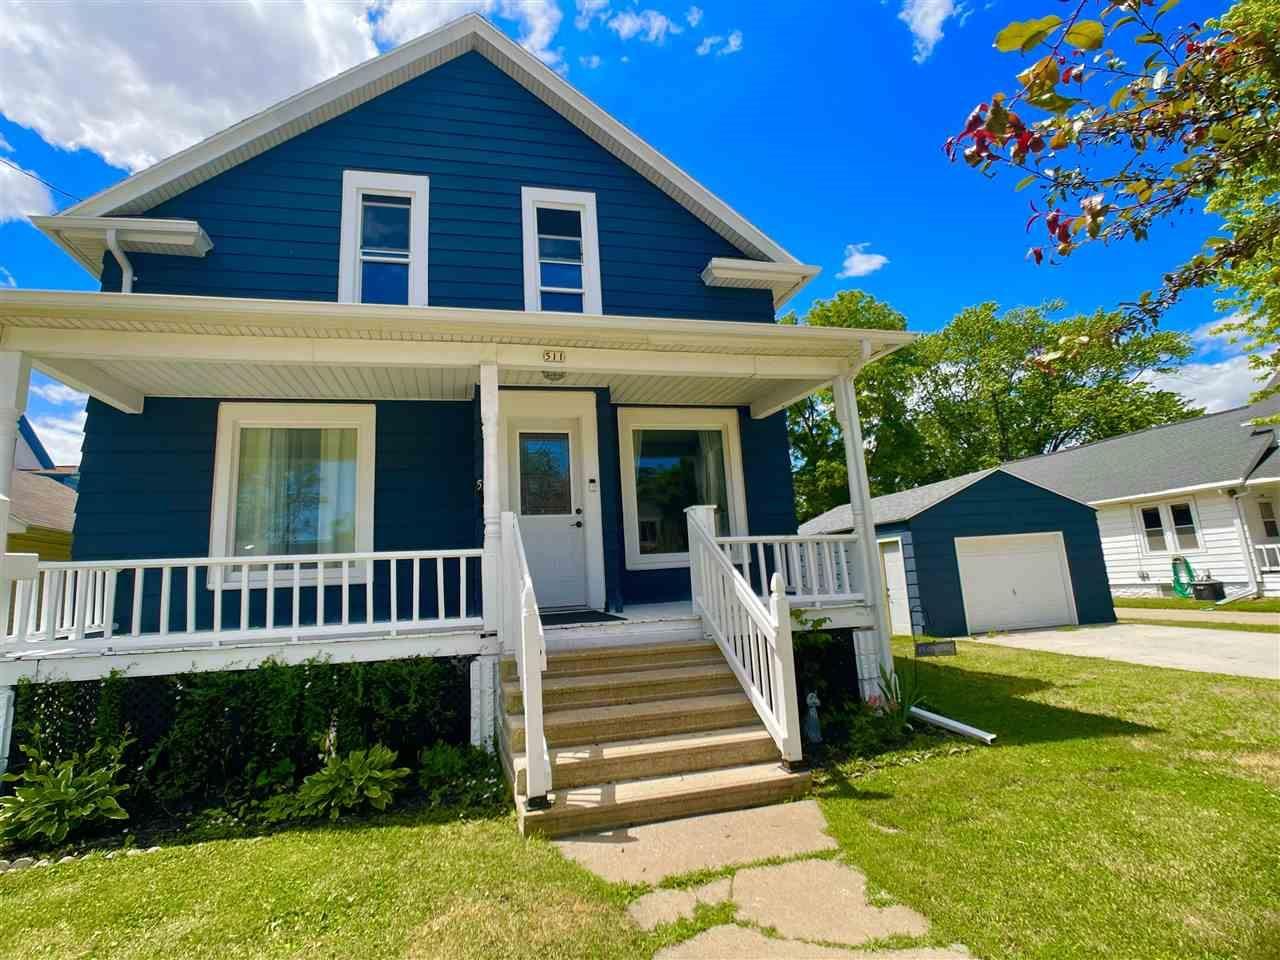 511 GROVE Street, Oshkosh, WI 54901 - MLS#: 50239863